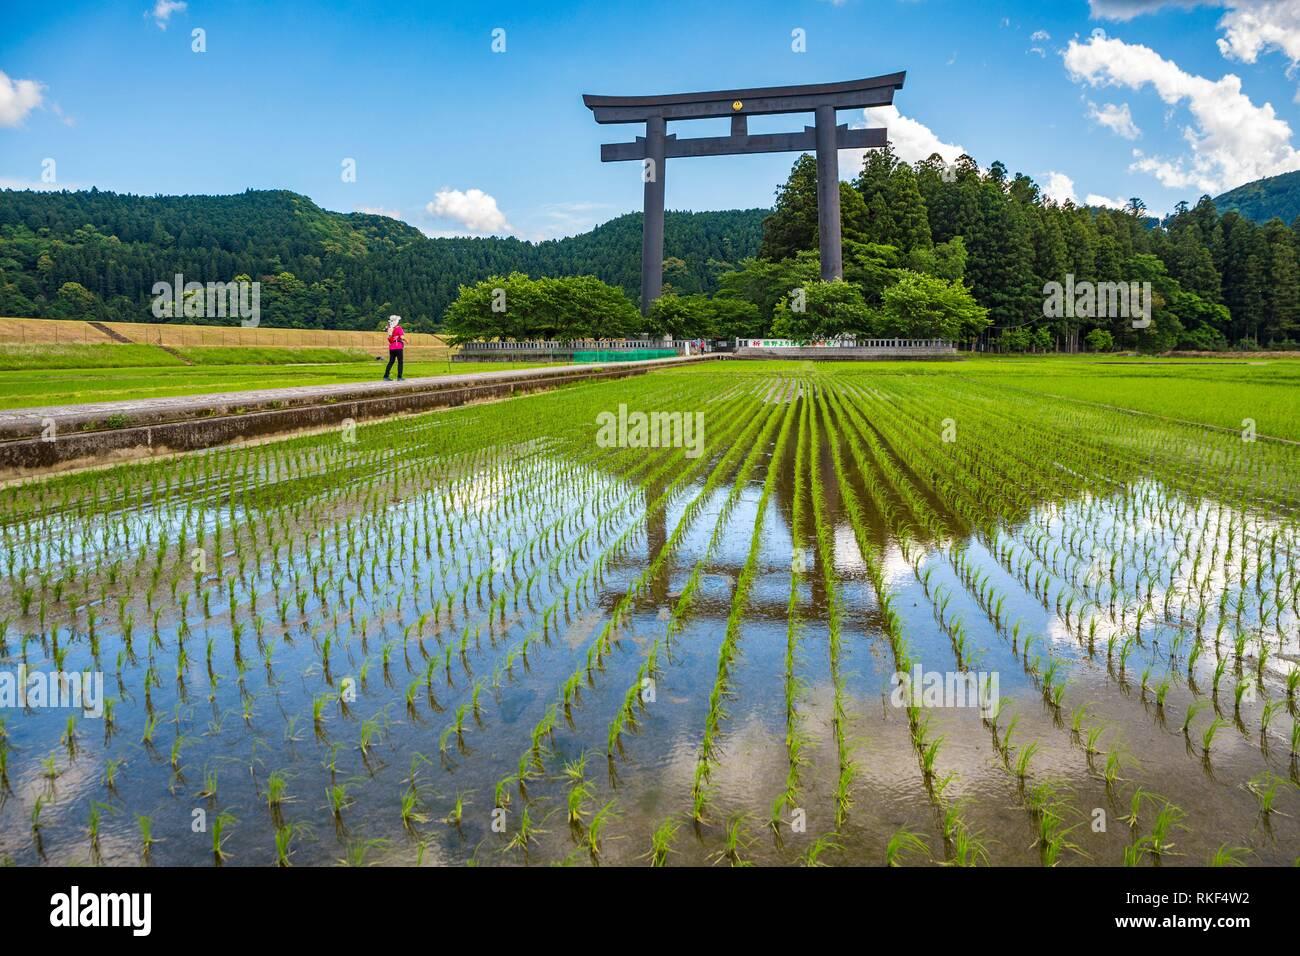 Kumano Kodo pilgrimage route. Otorii. Tori shrine gate that marks the entrance to Oyunohara. Nakahechi. Wakayama Prefecture. Kii Peninsula. Kansai - Stock Image